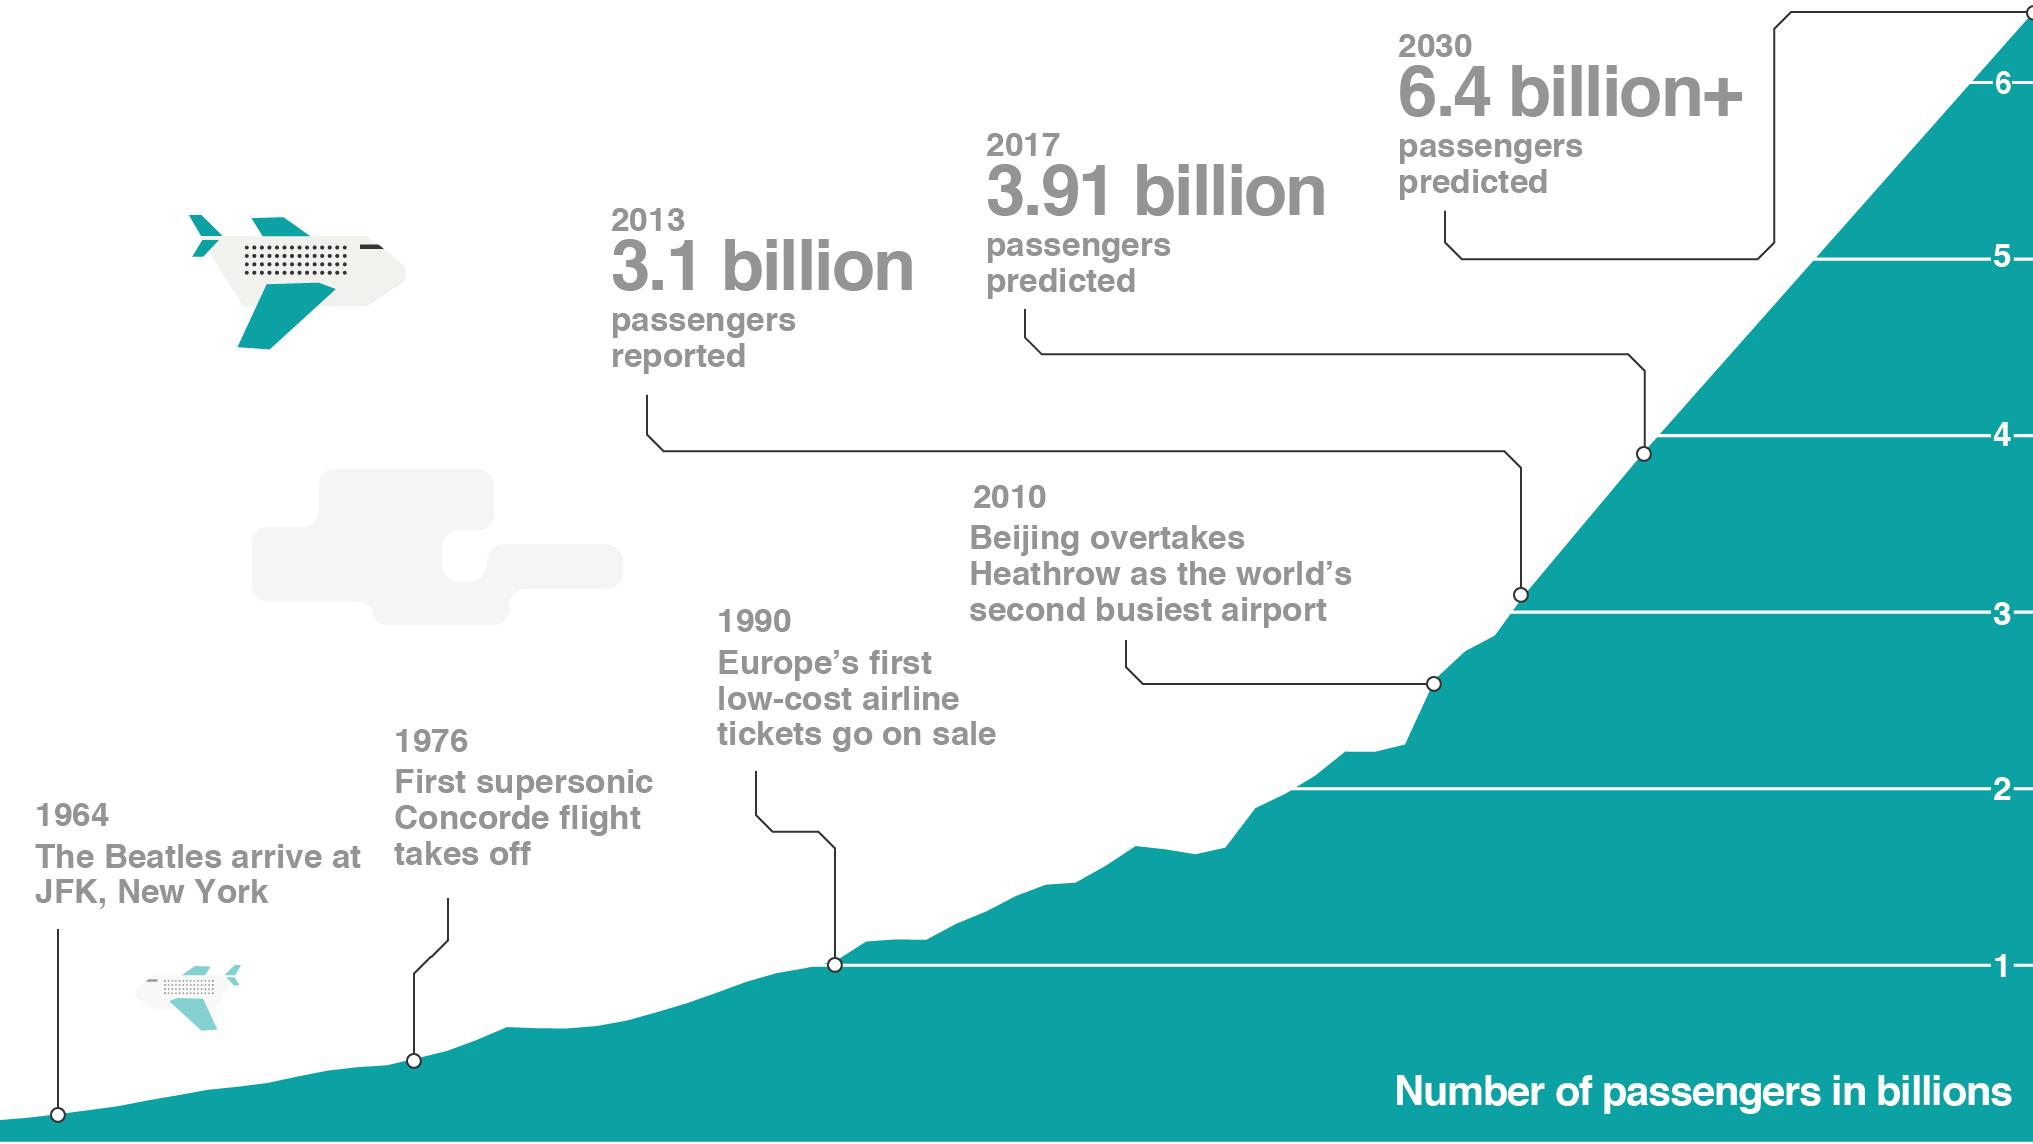 The future of airline profitability